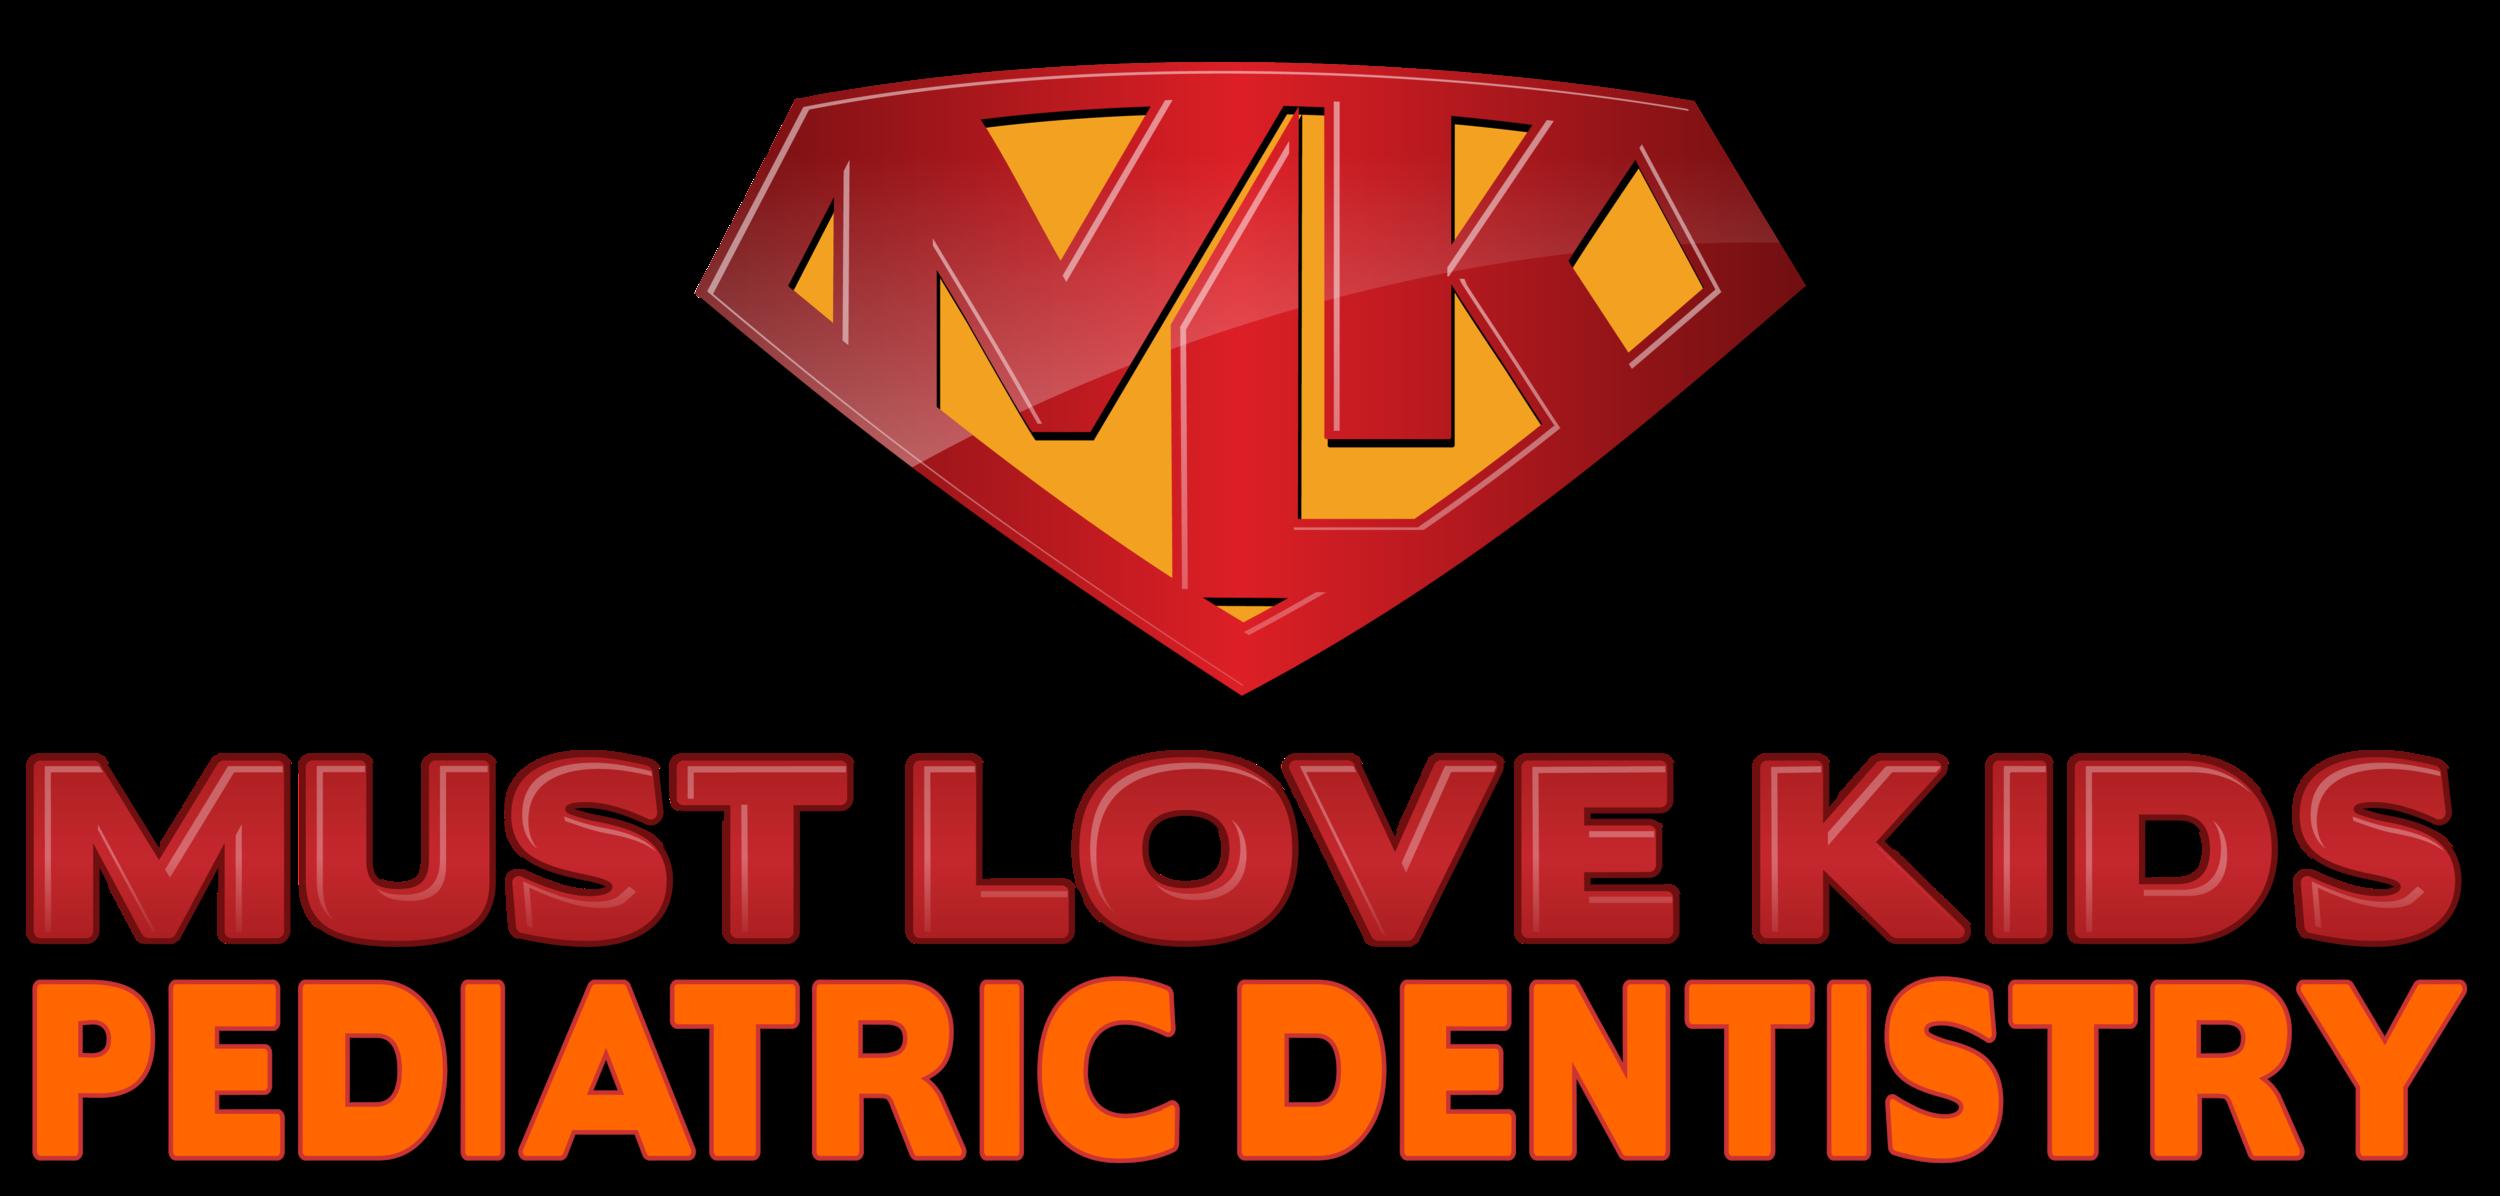 Must Love Kids Pediatric Dentistry.png